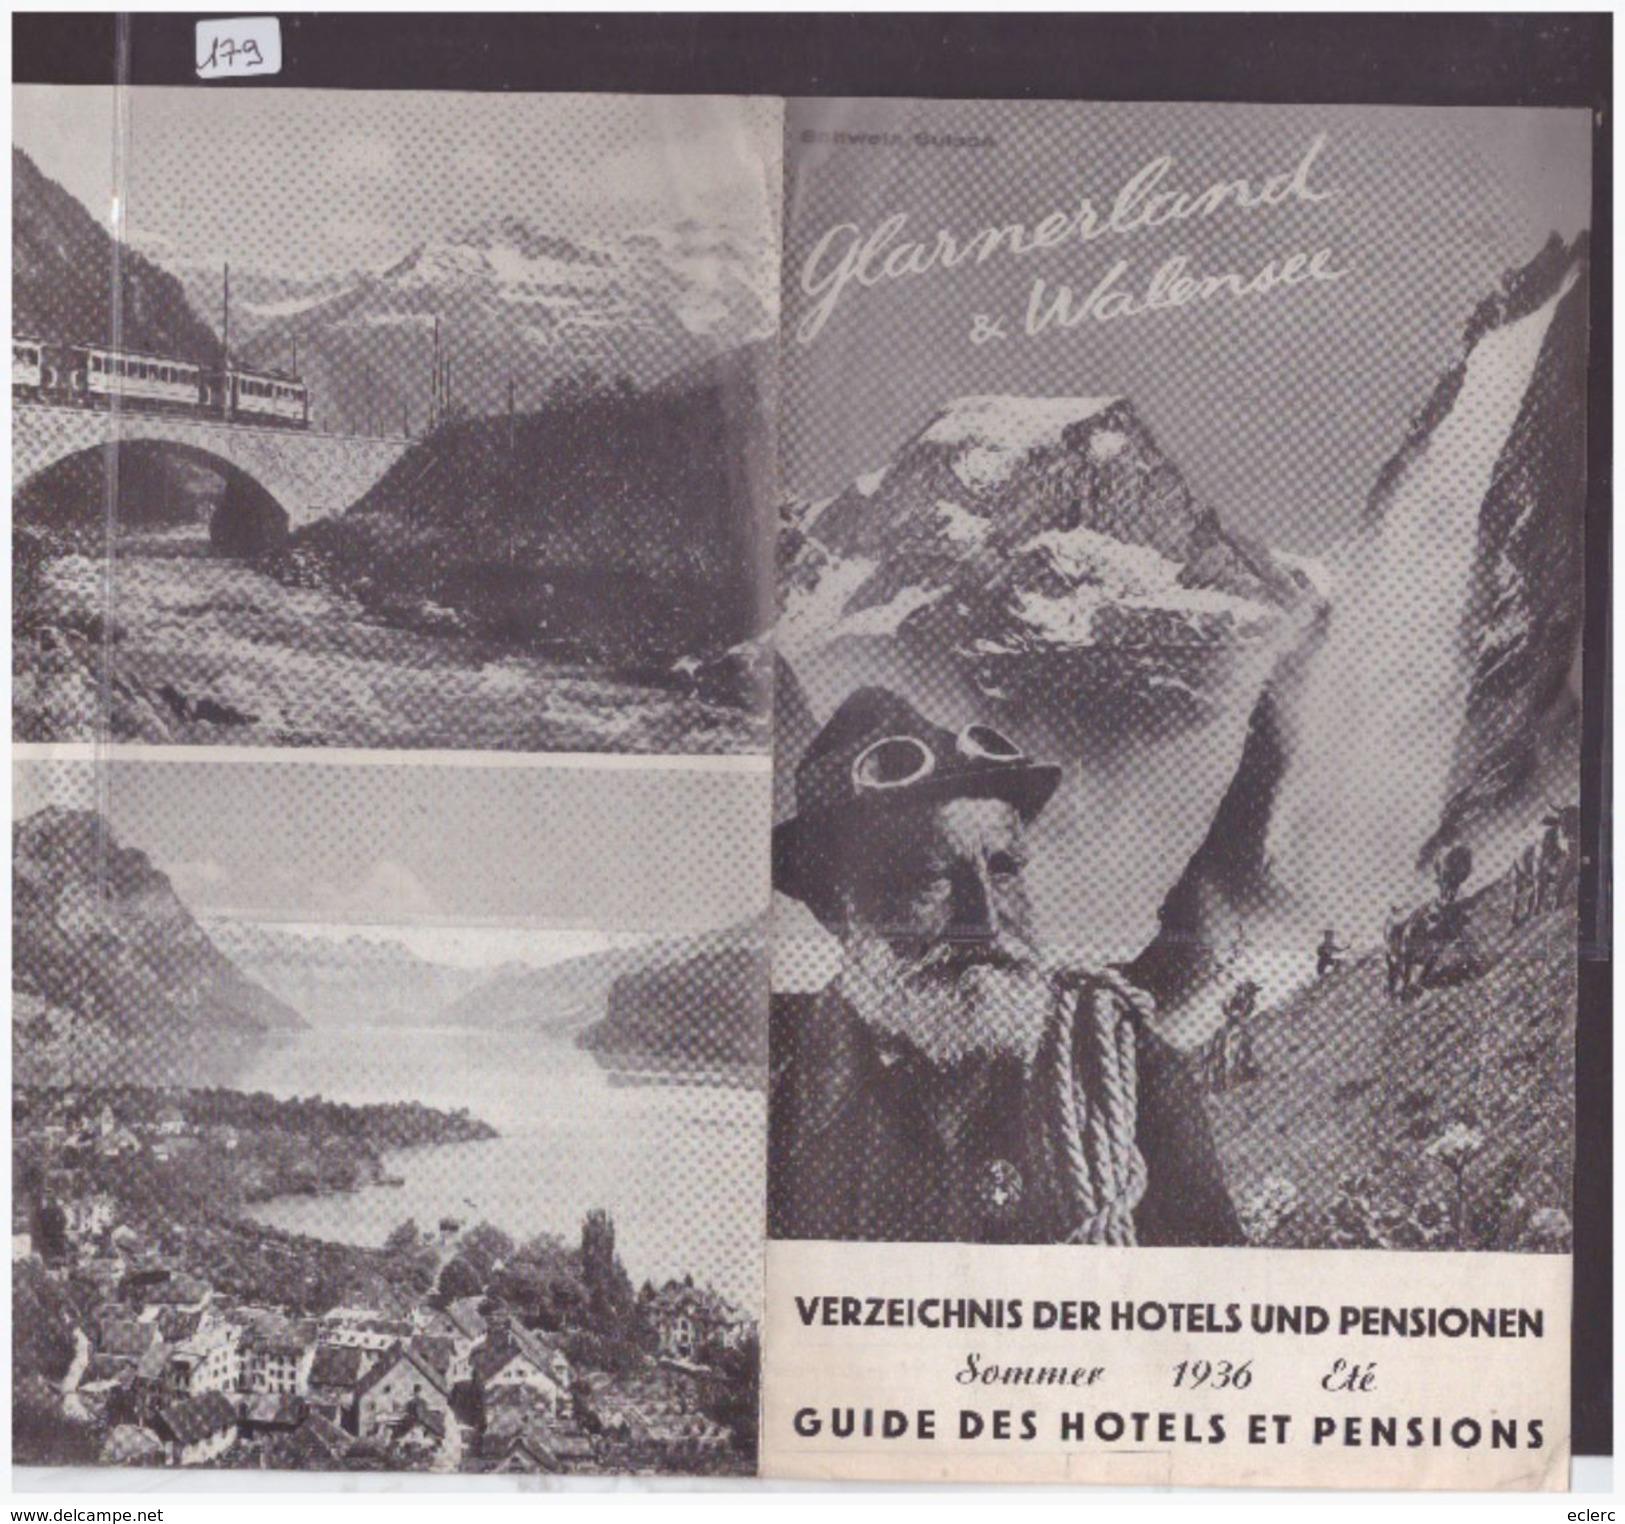 GLARUS SUISSE - GLARNERLAND & WALENSEE - DEPLIANT 2 VOLETS - TB - Tourism Brochures